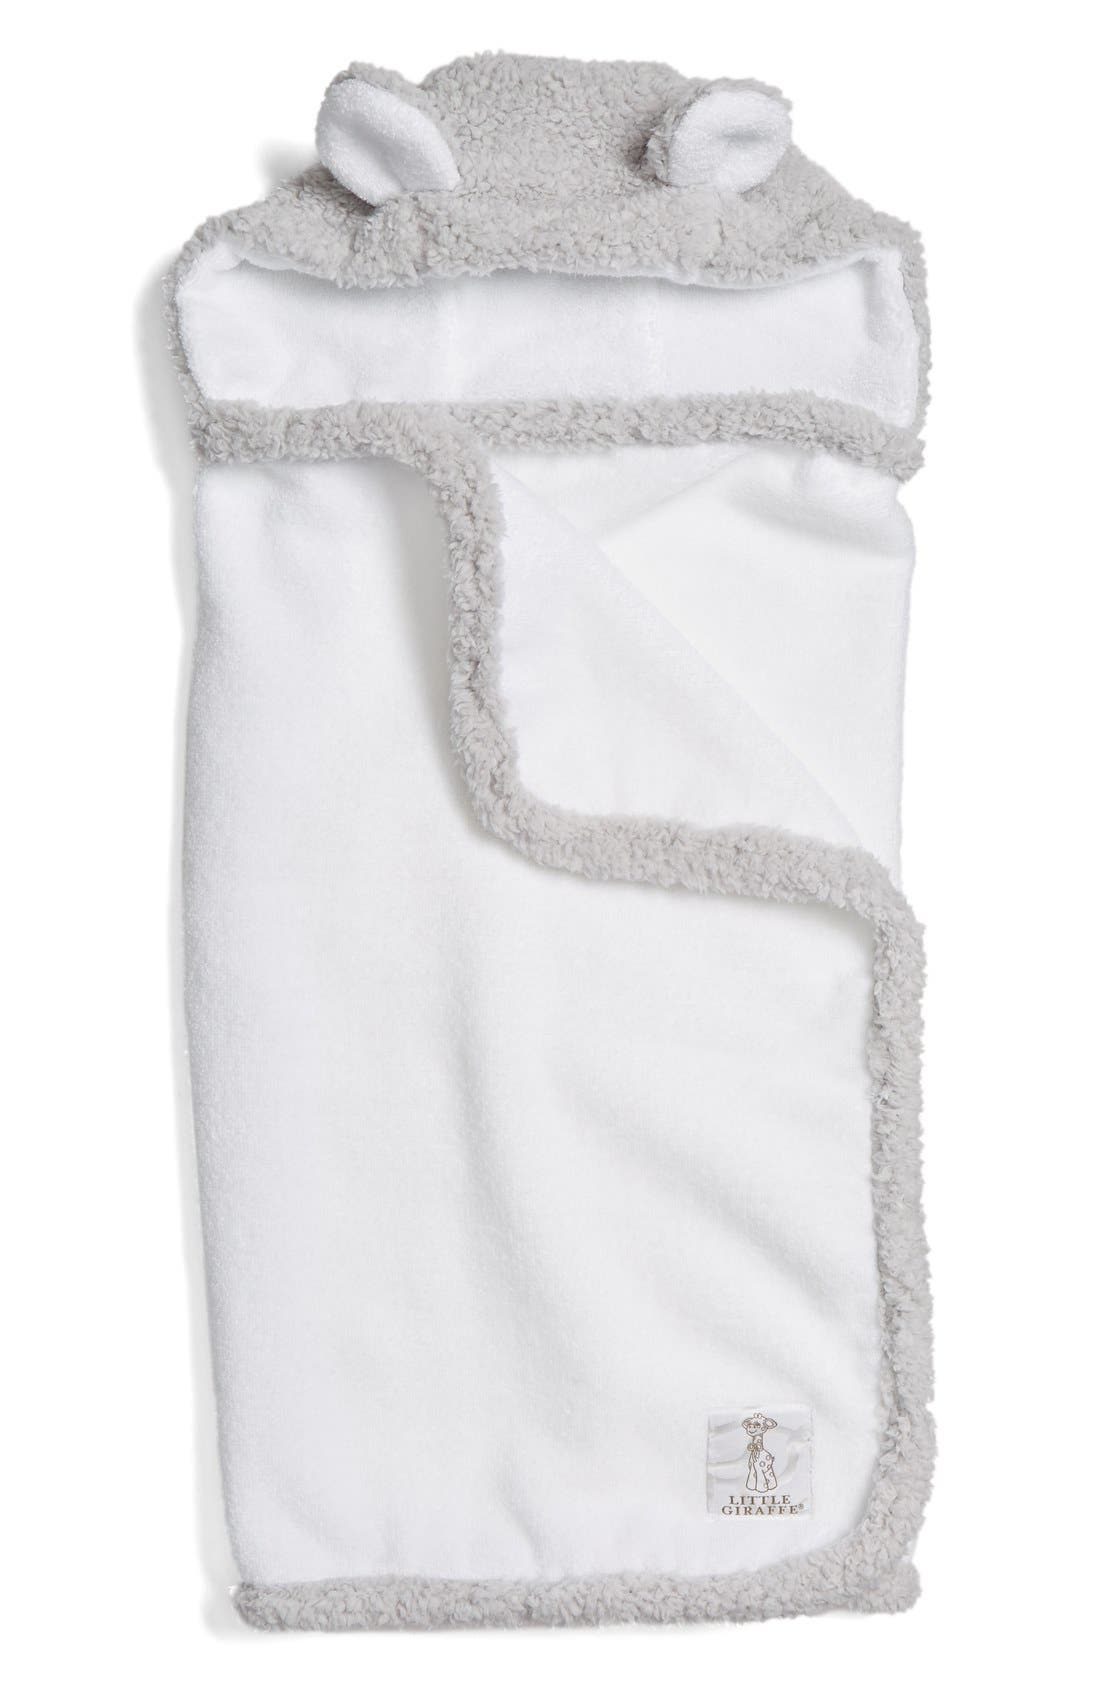 Little Giraffe 'Bella™' Towel